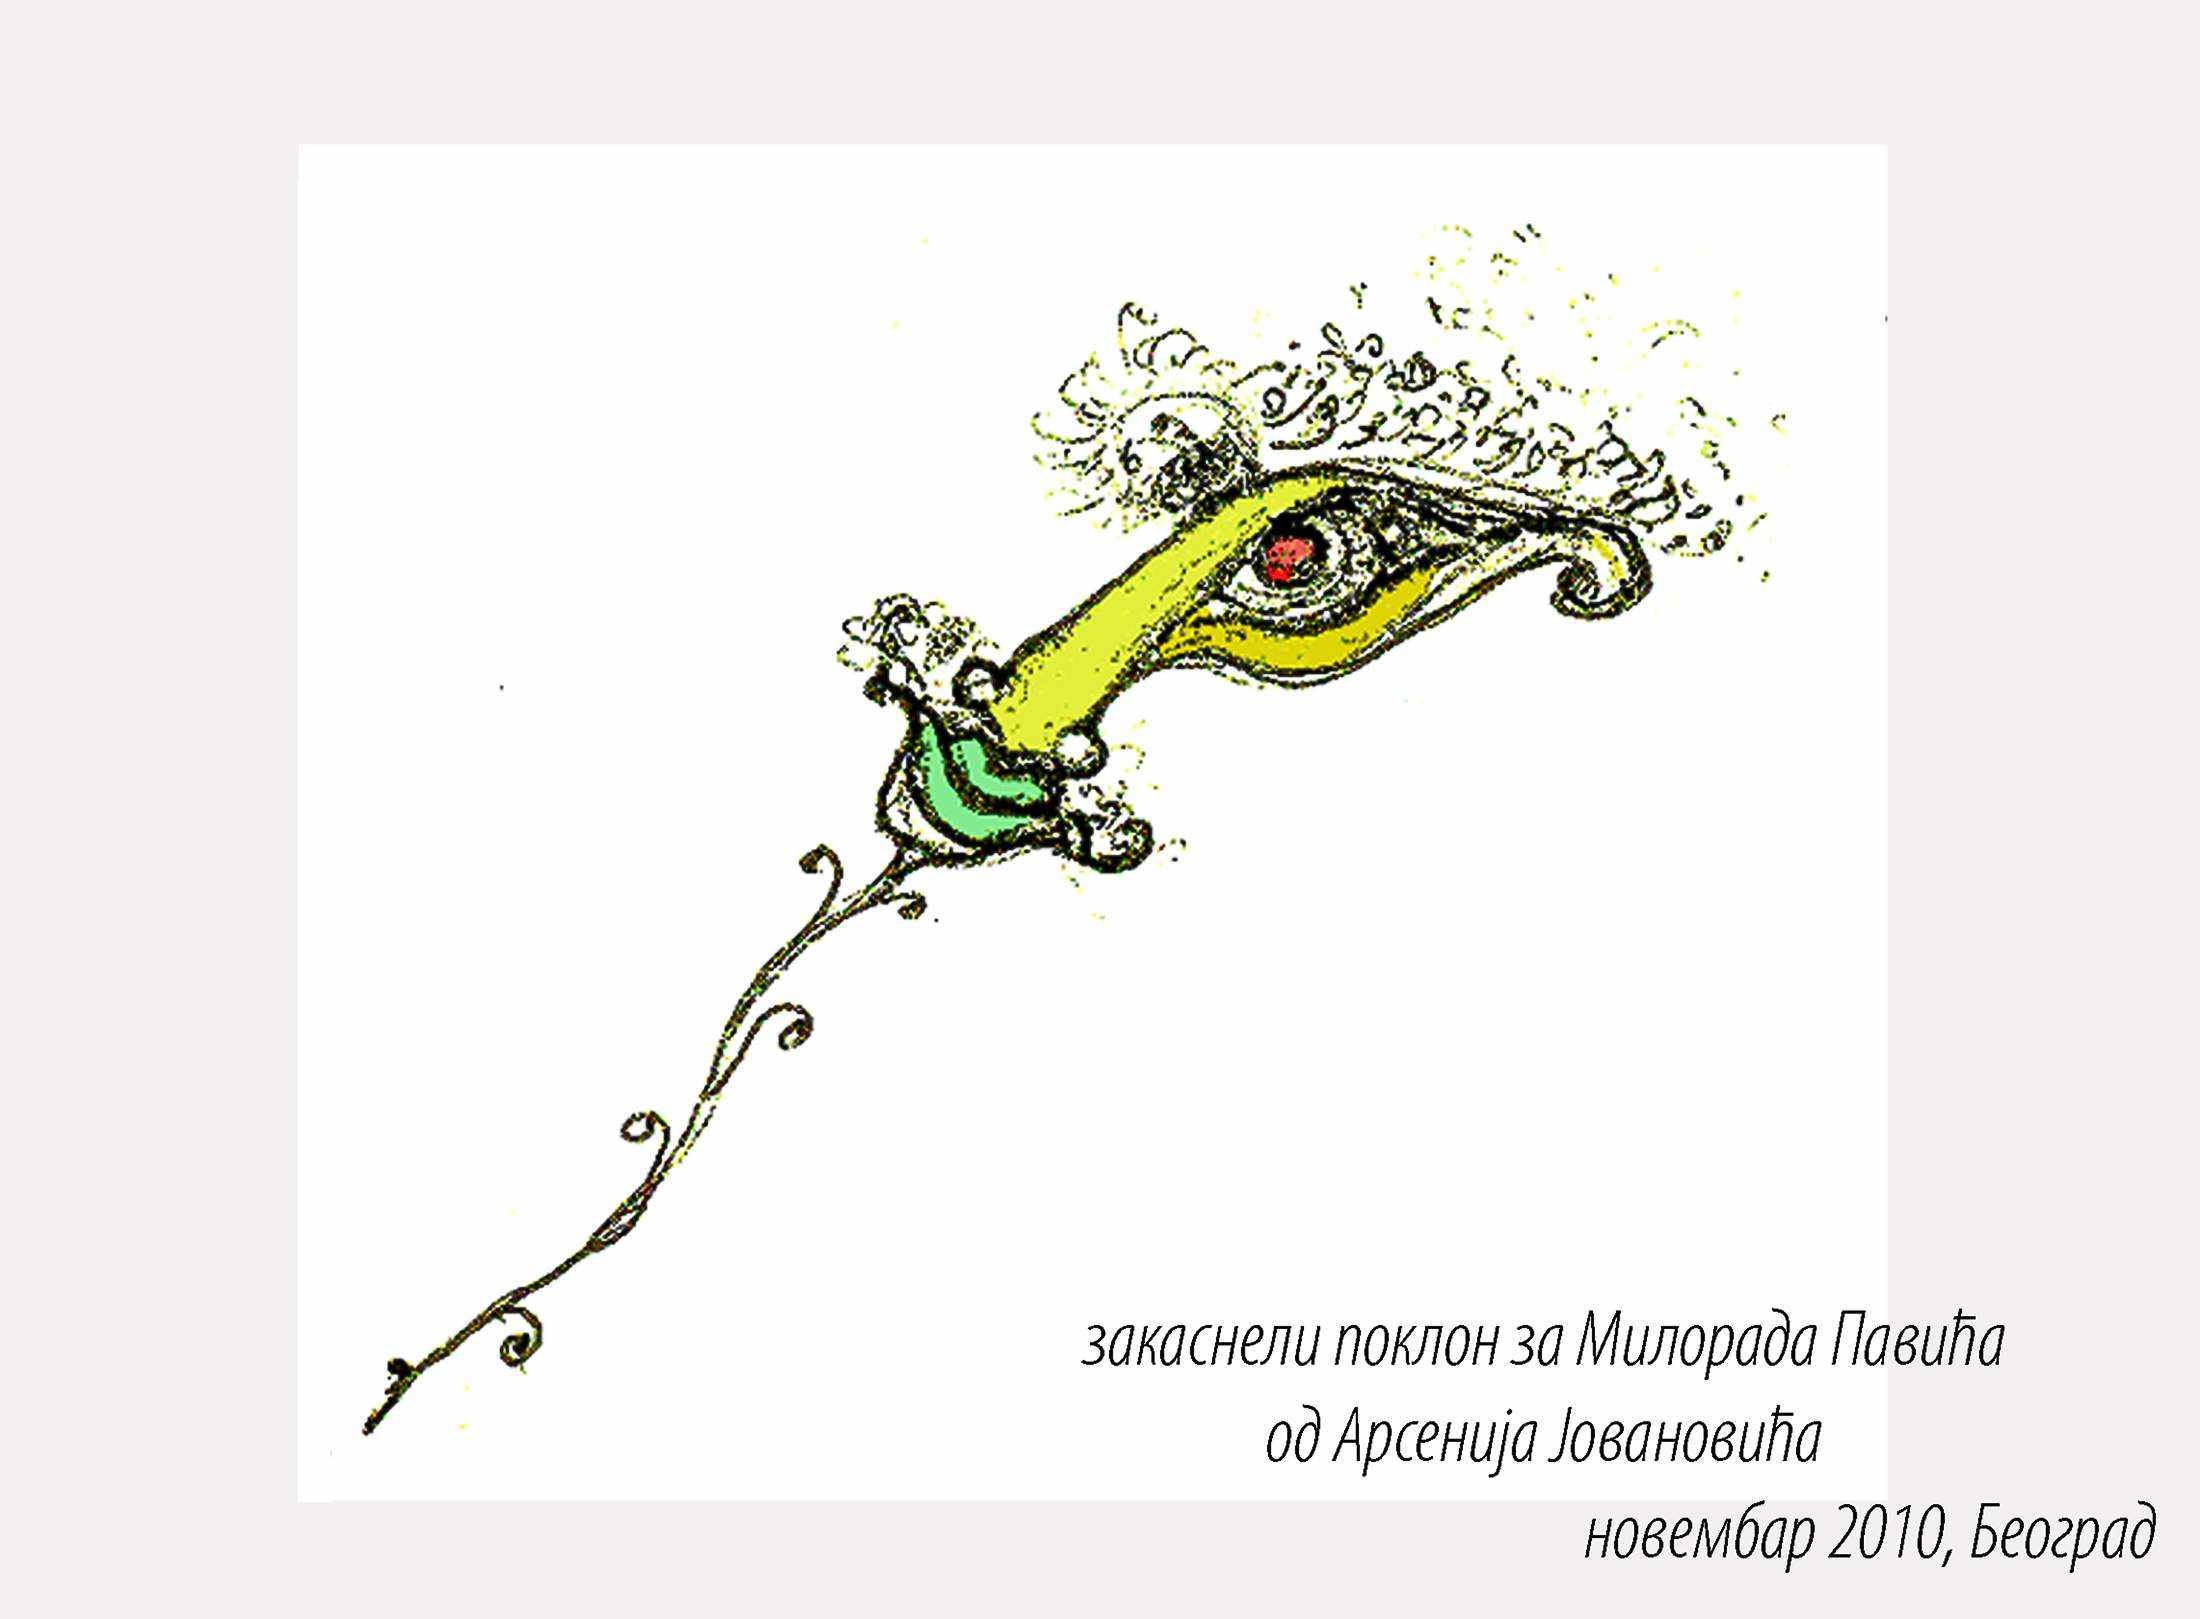 Posveta Arse jovanovica